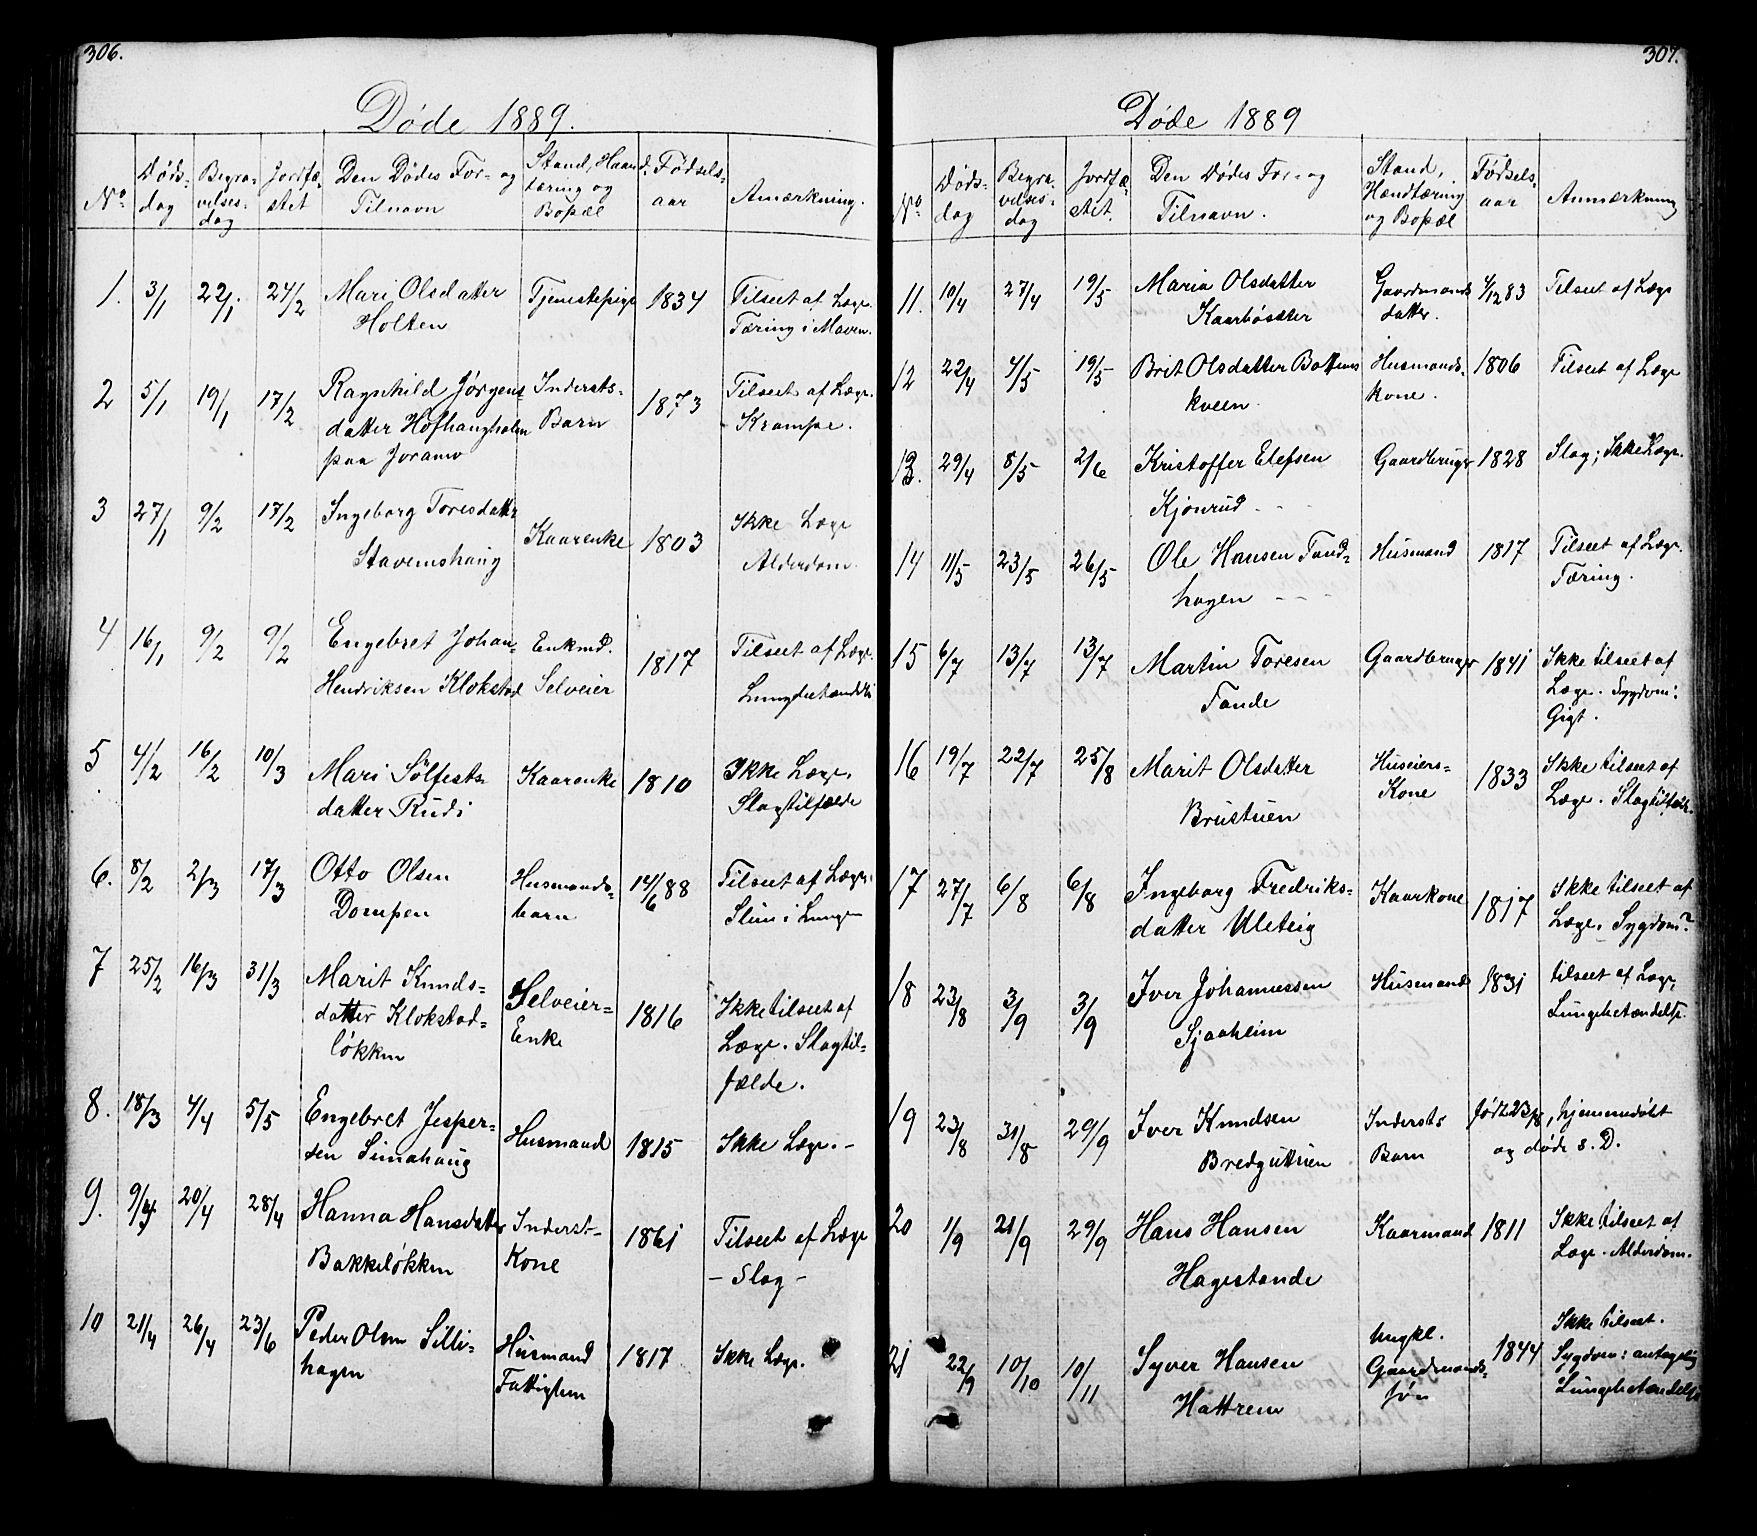 SAH, Lesja prestekontor, Klokkerbok nr. 5, 1850-1894, s. 306-307